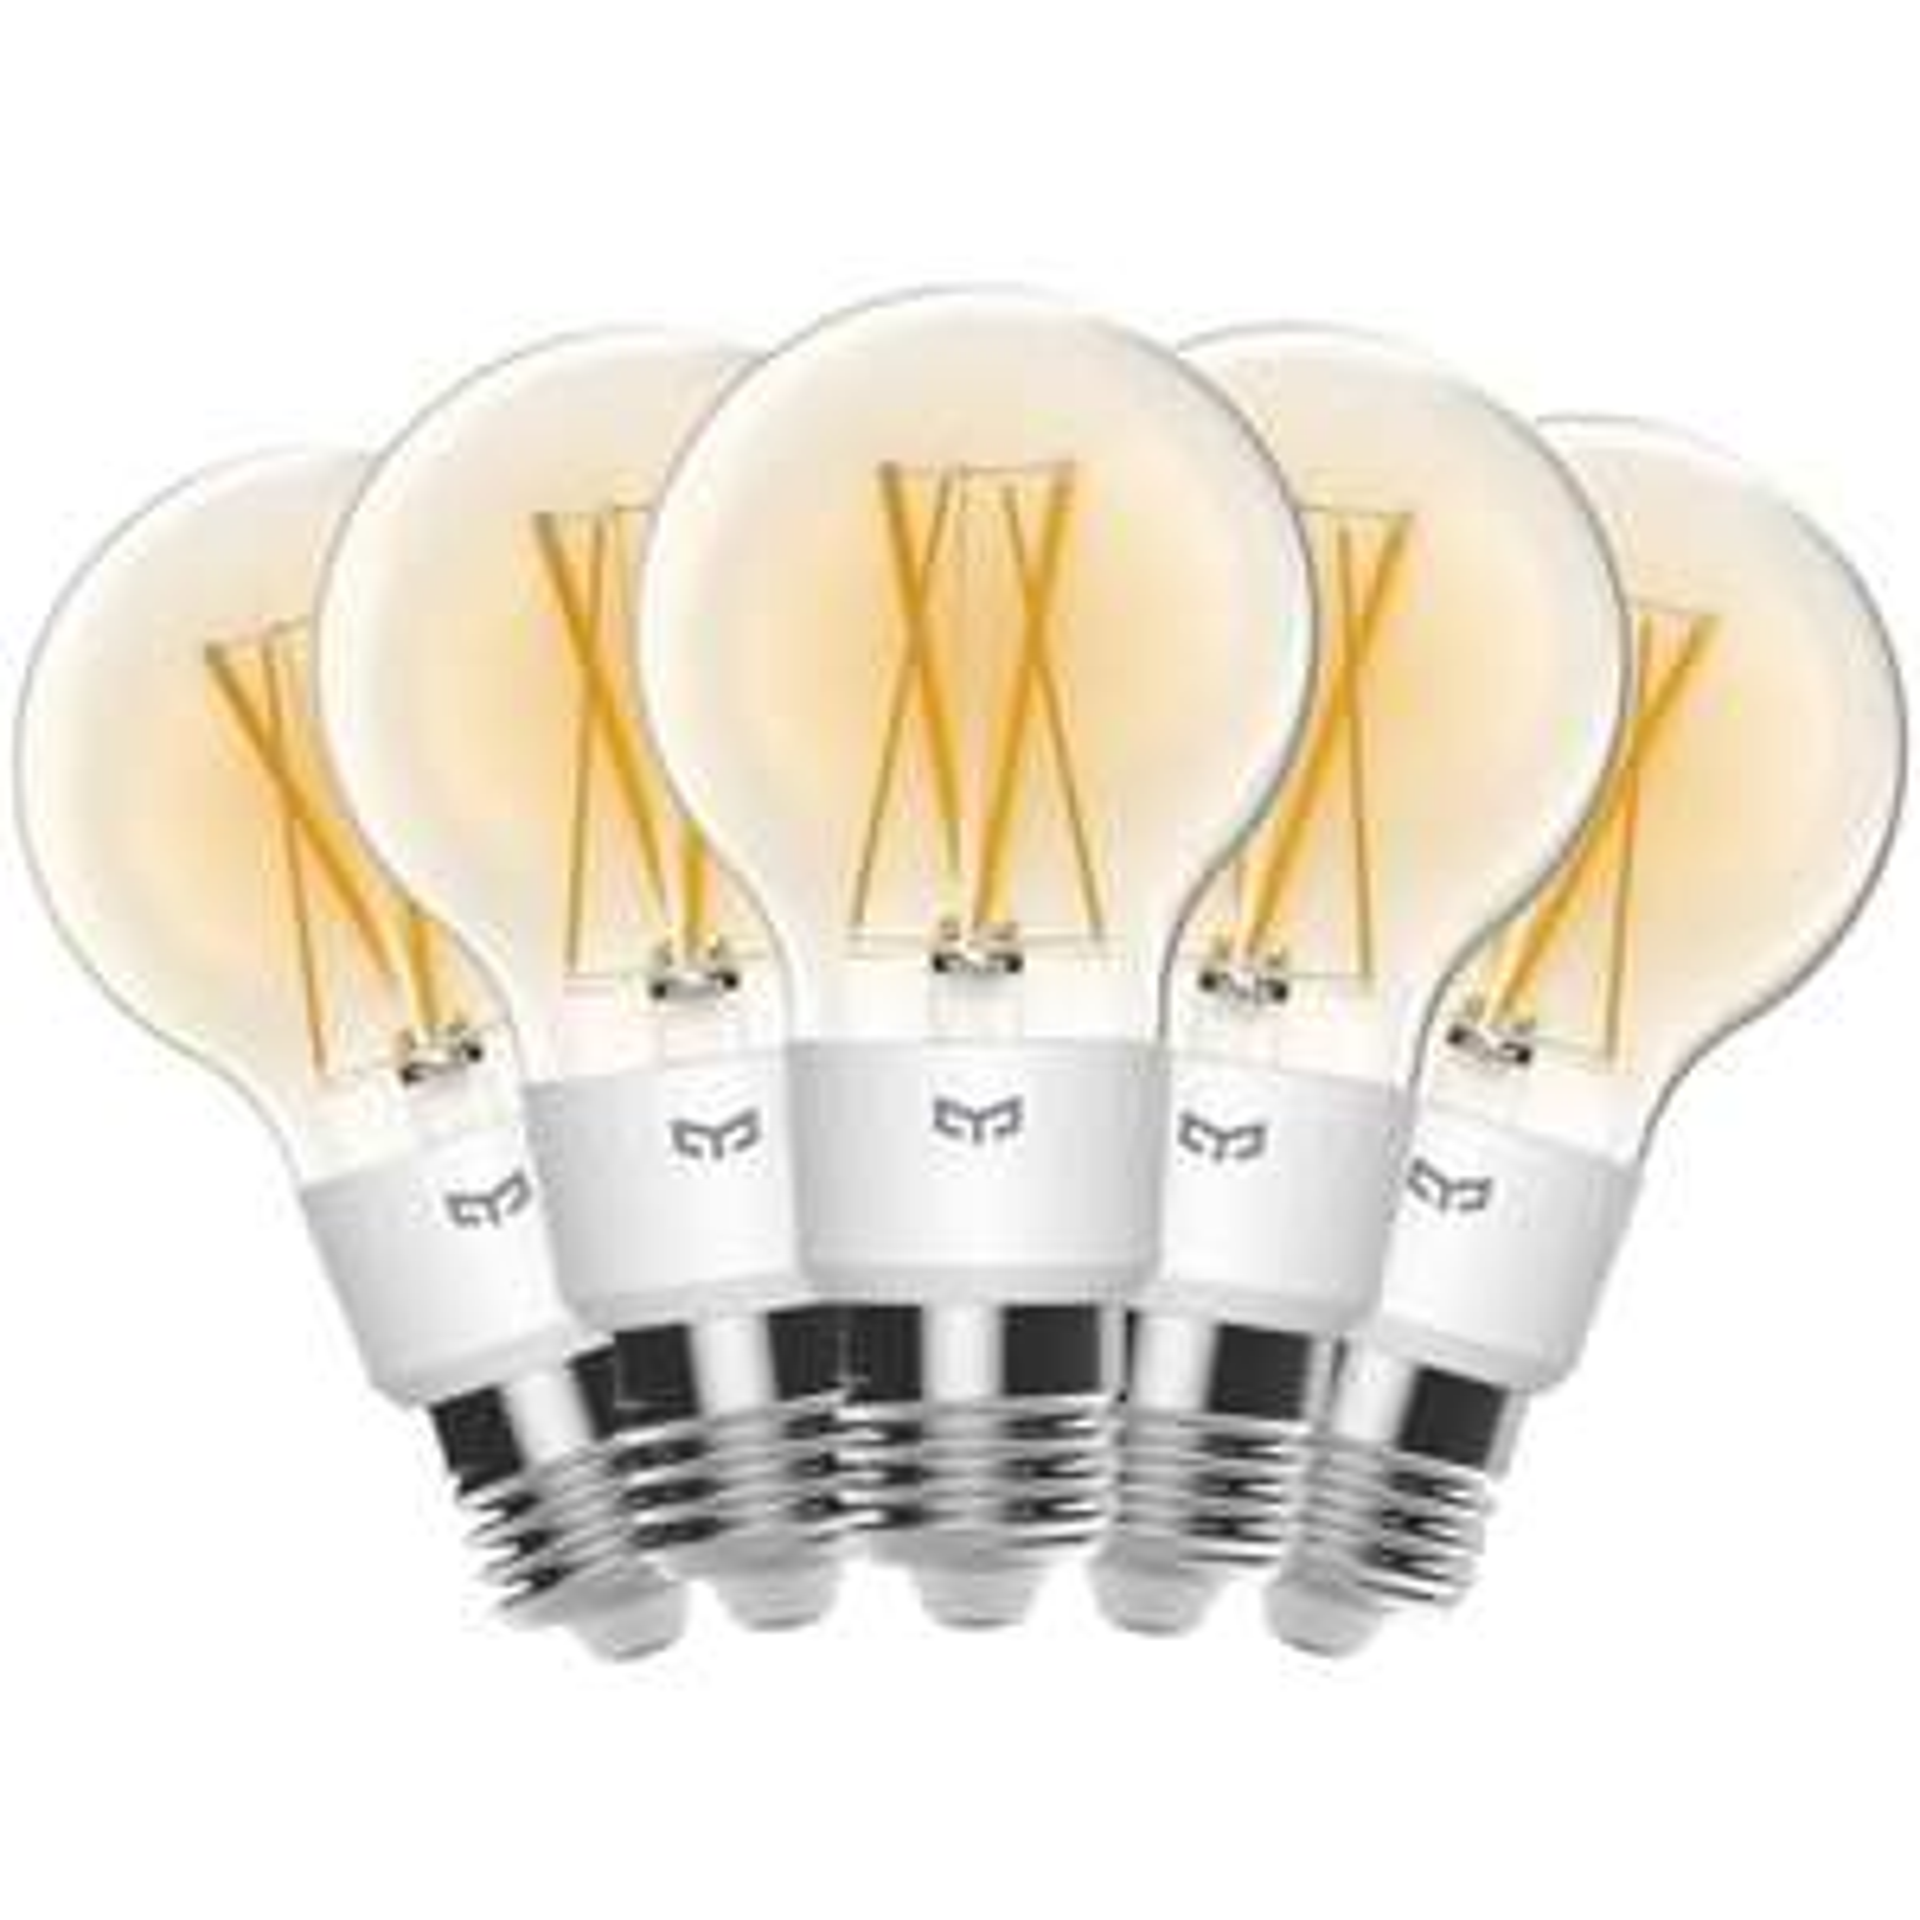 5er Bundle: Yeelight Filament - Smarte LED-Lampe aus DE   3 Stück für 37€ (E27, HomeKit / Google / Alexa, 35 - 700 Lumen, 2700 Kelvin)